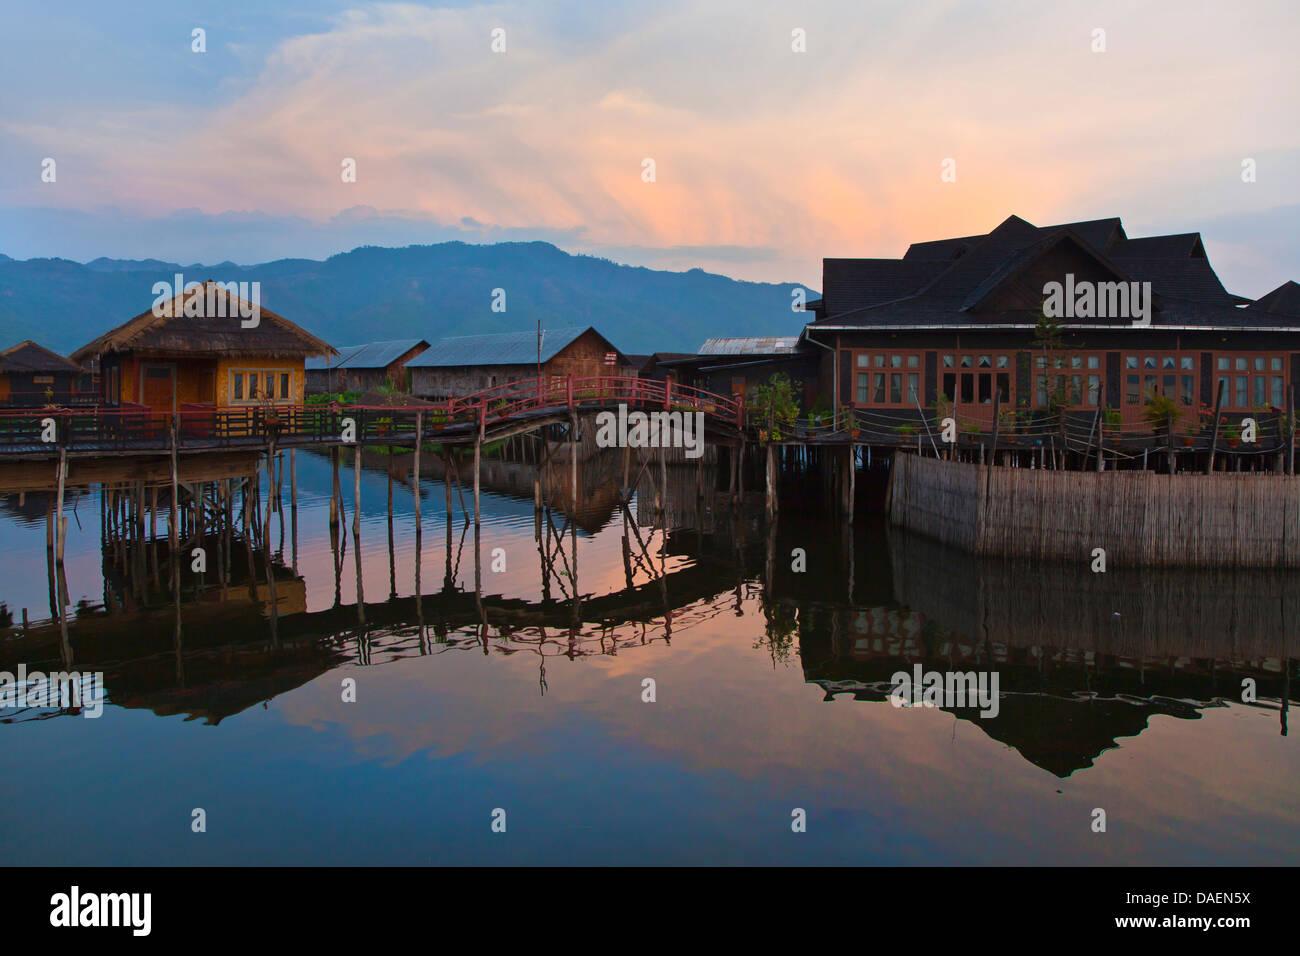 Sky Lake Resort consists of individual bungalows built on stilts on Inle Lake, Burma - Stock Image